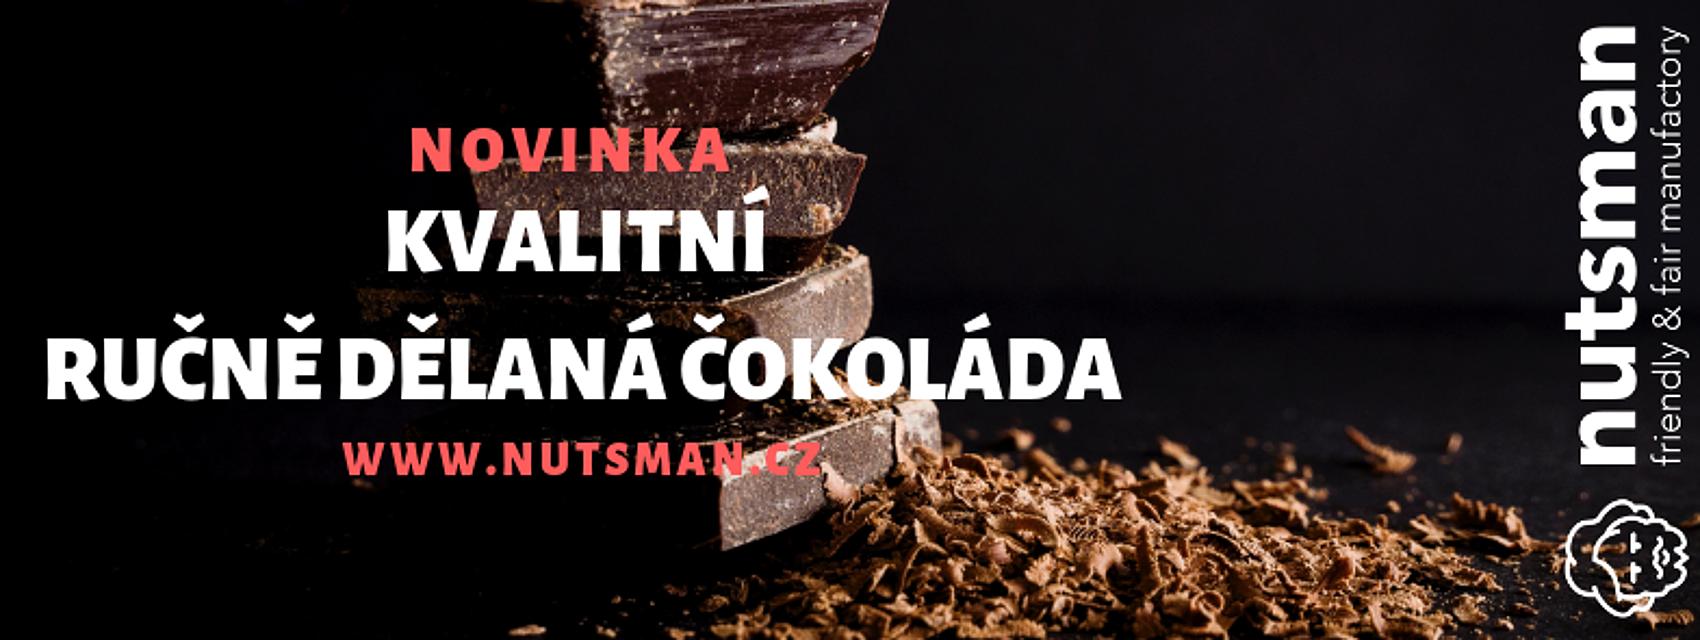 https://www.nutsman.cz/cokolada/